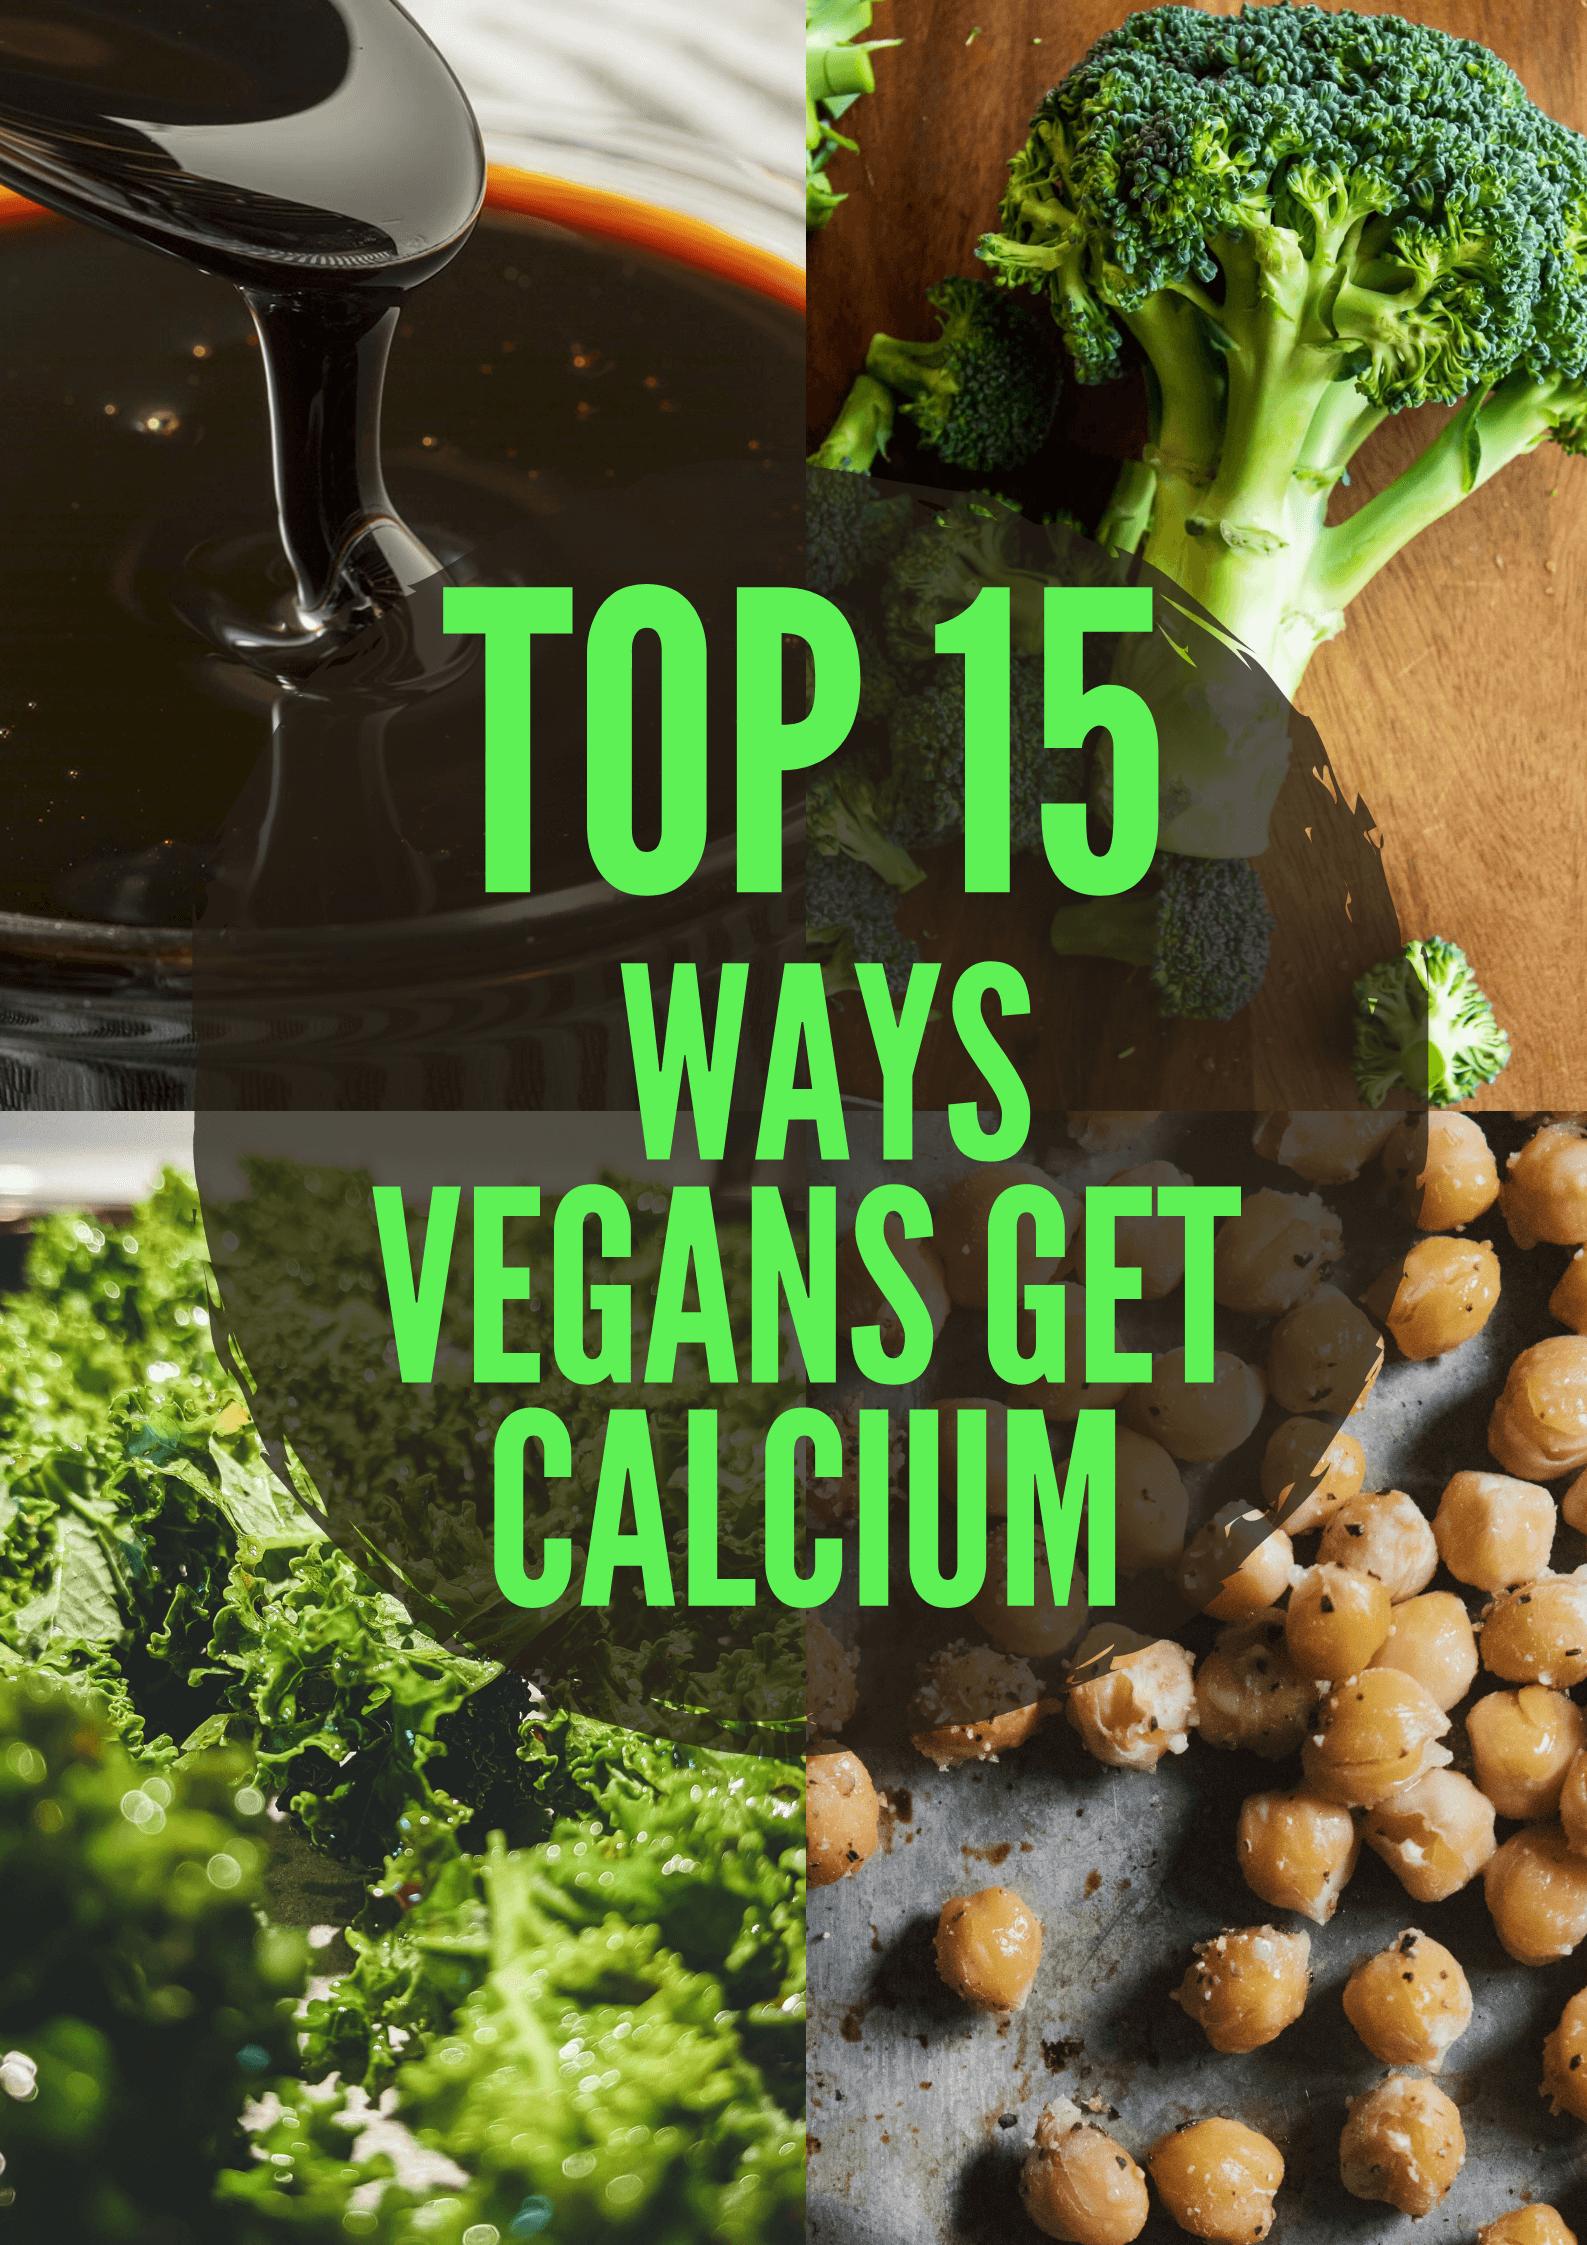 Top 15 Ways Vegans Get Calcium